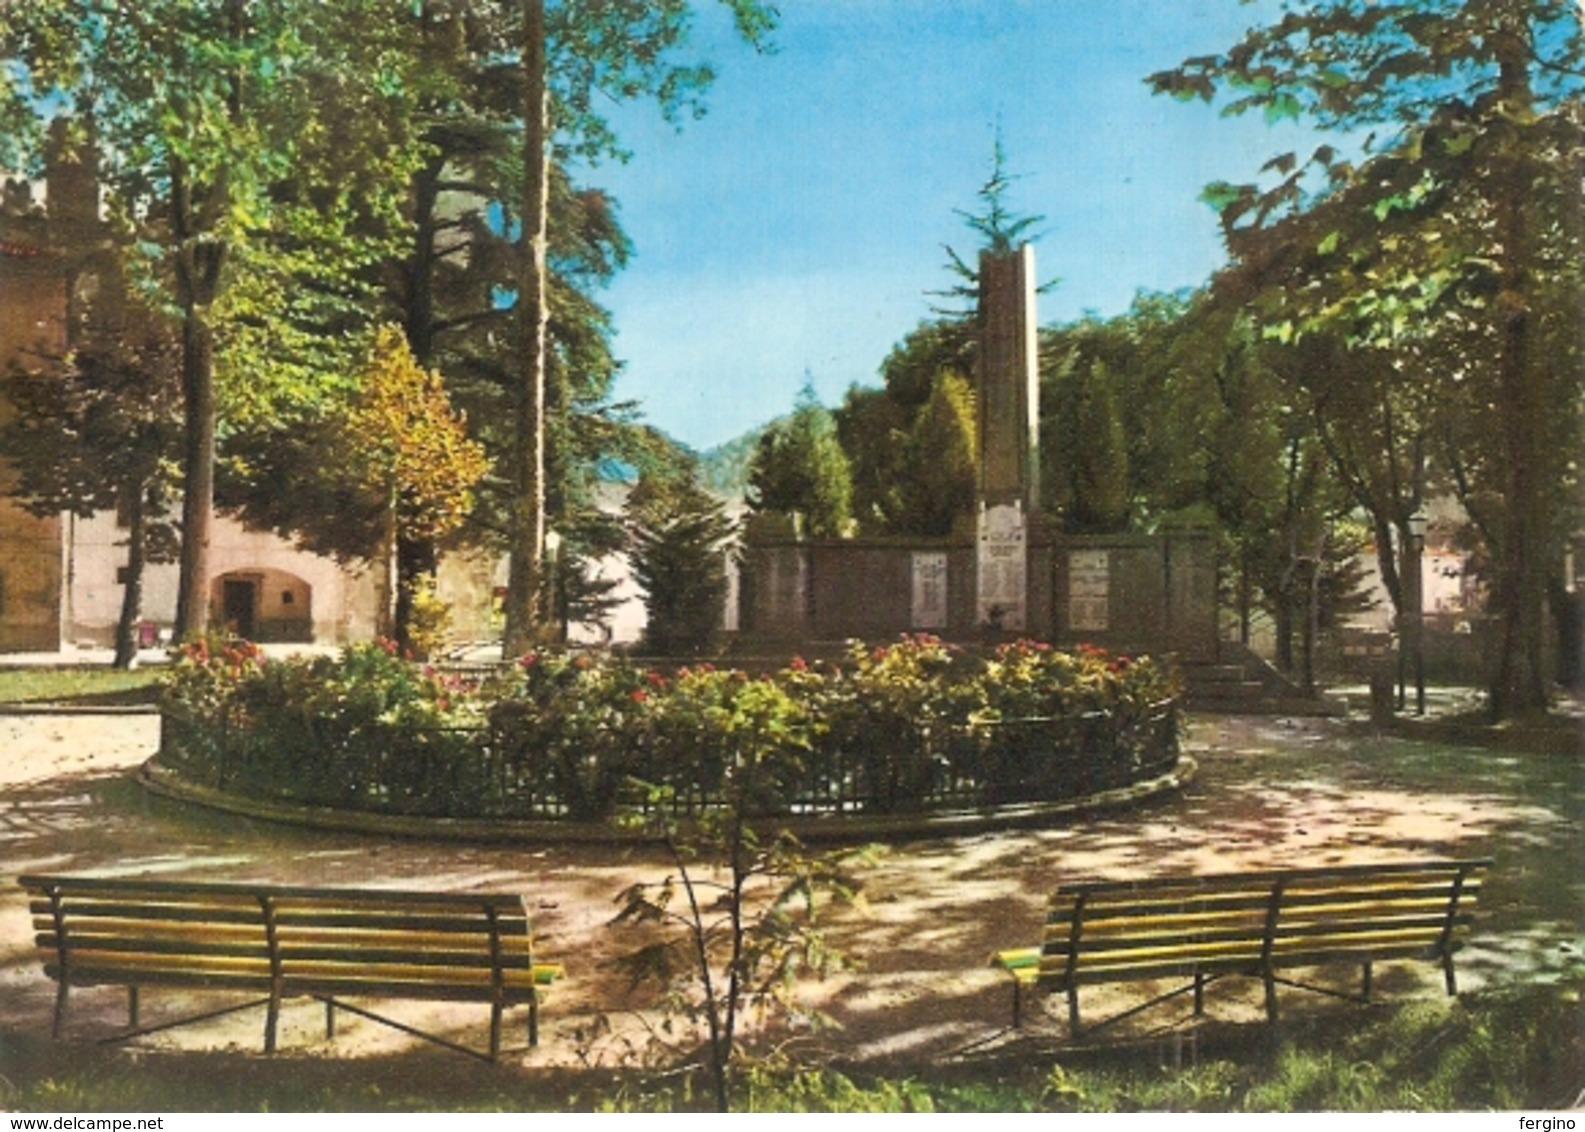 101/FG/18 - SAVONA - MILLESIMO: Giardini Pubblici - Savona